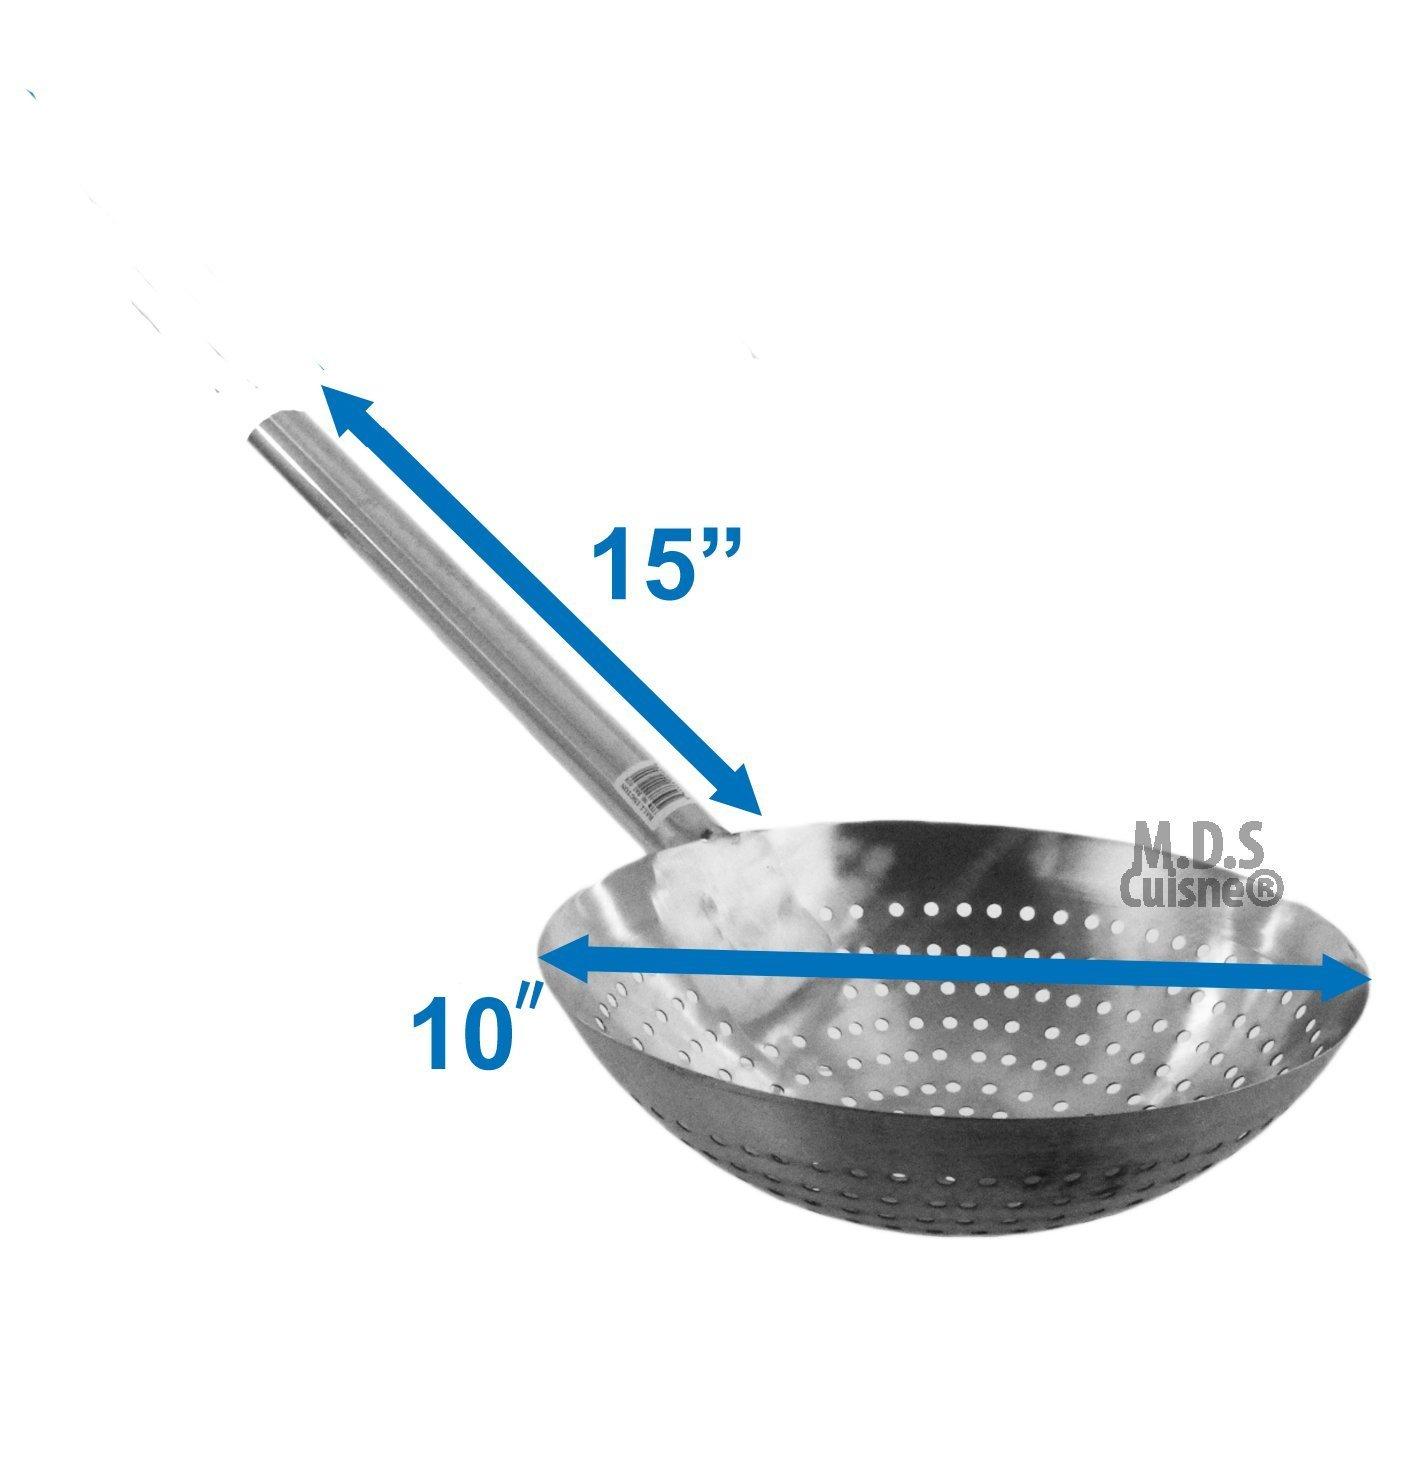 Amazon.com: Stainless Steel Stir Fry Skimmer Strainer 25